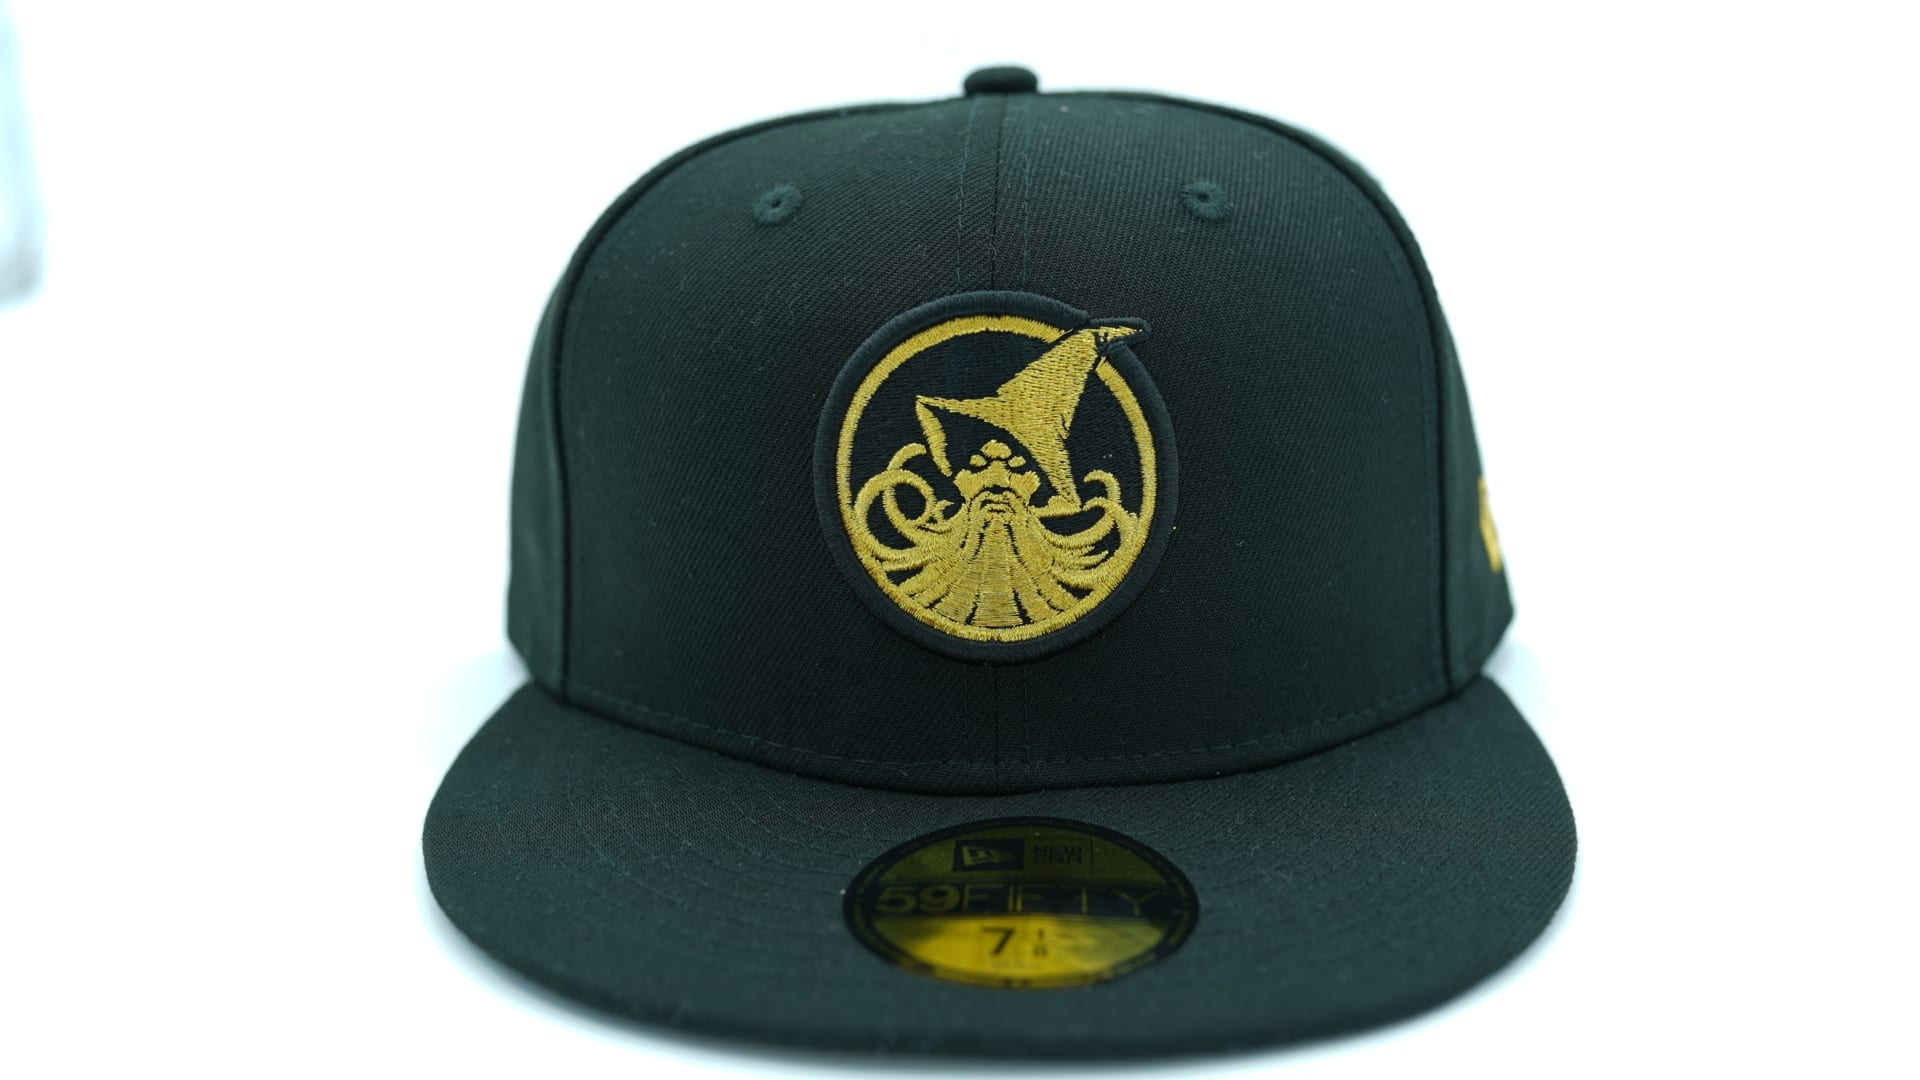 Call-Of-Duty-Black-Op-NEW-ERA-59Fifty-custom-2011-Fitted-Baseball-Cap-hat_2